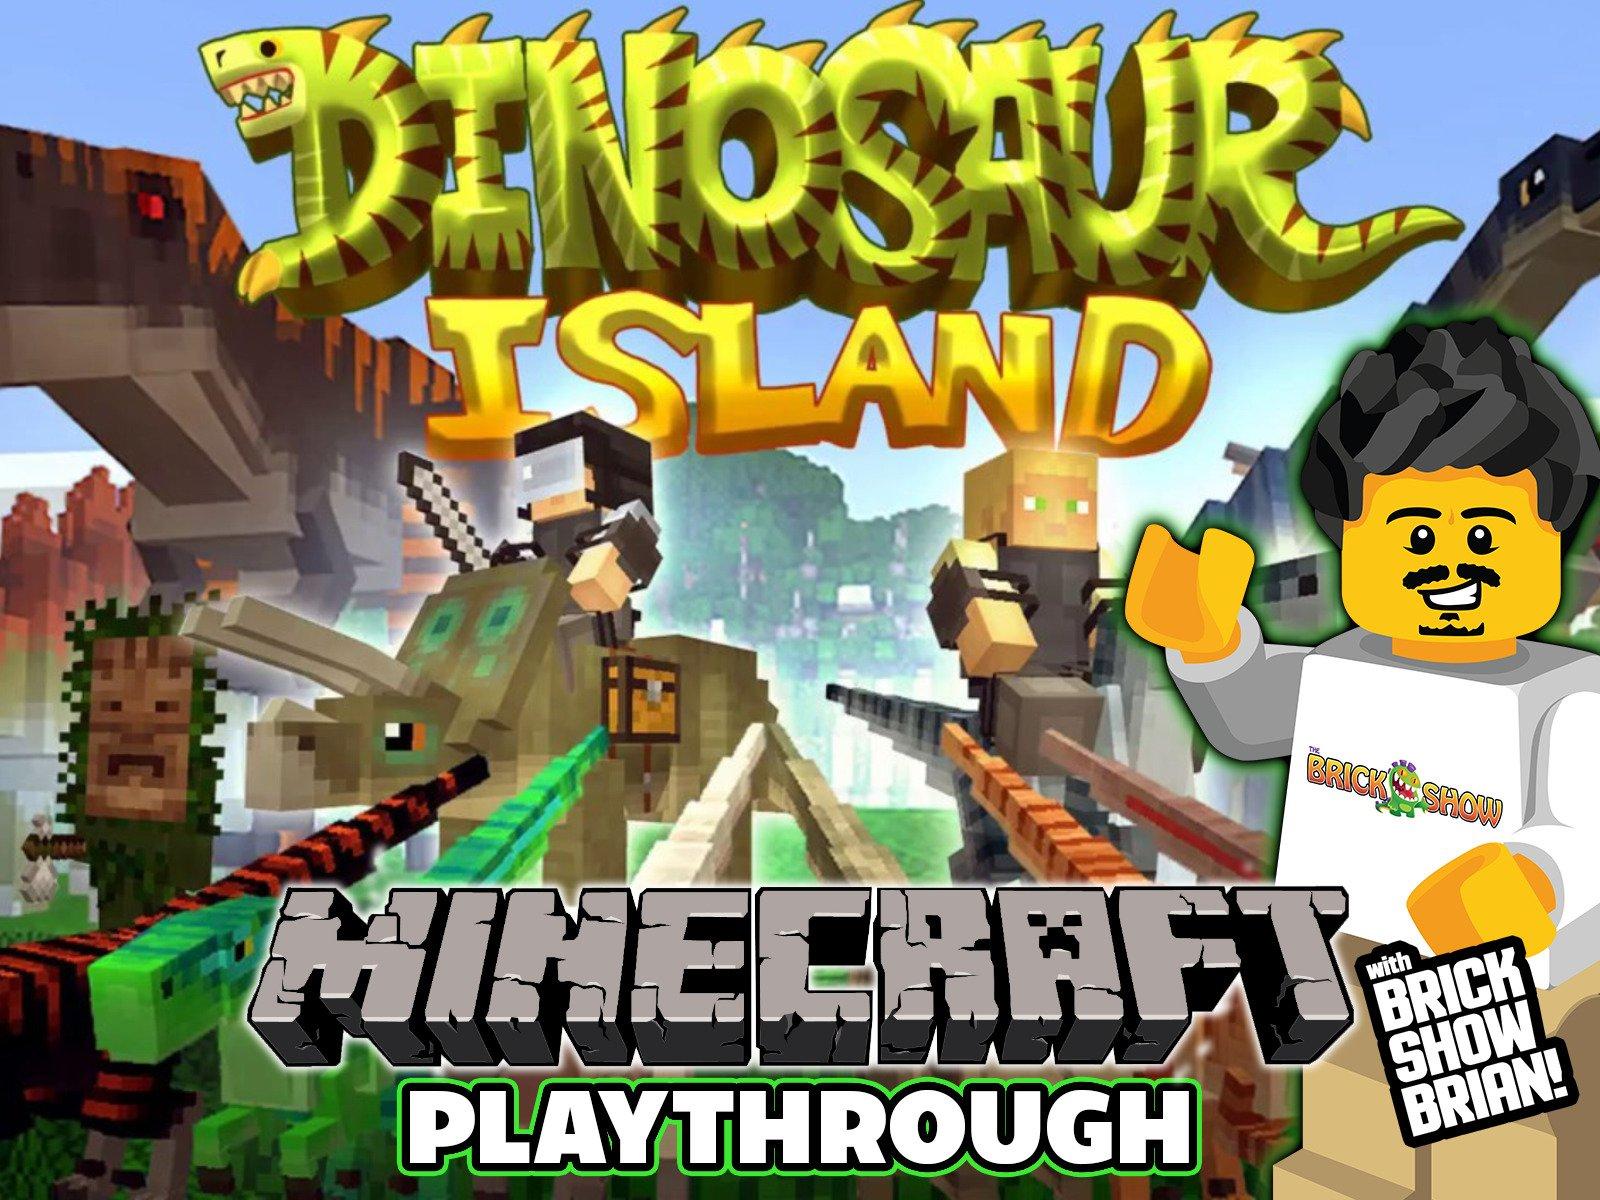 Clip: Dinosaur Island Minecraft Playthrough with Brick Show Brian - Season 1